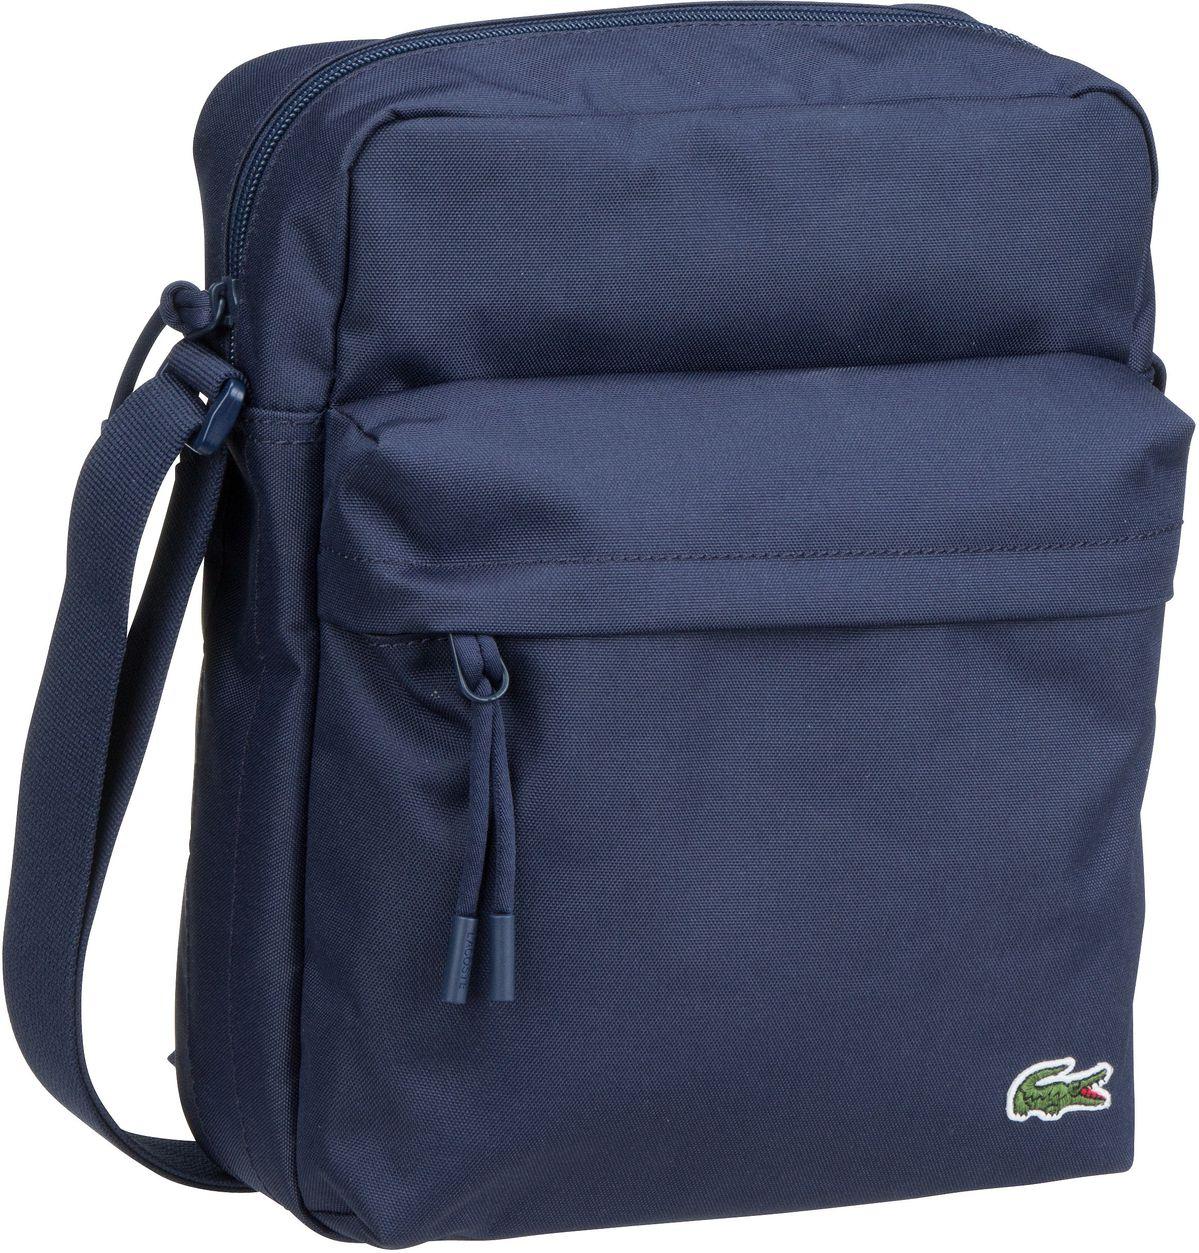 Umhängetasche Neocroc Crossover Bag 2012 Peacoat